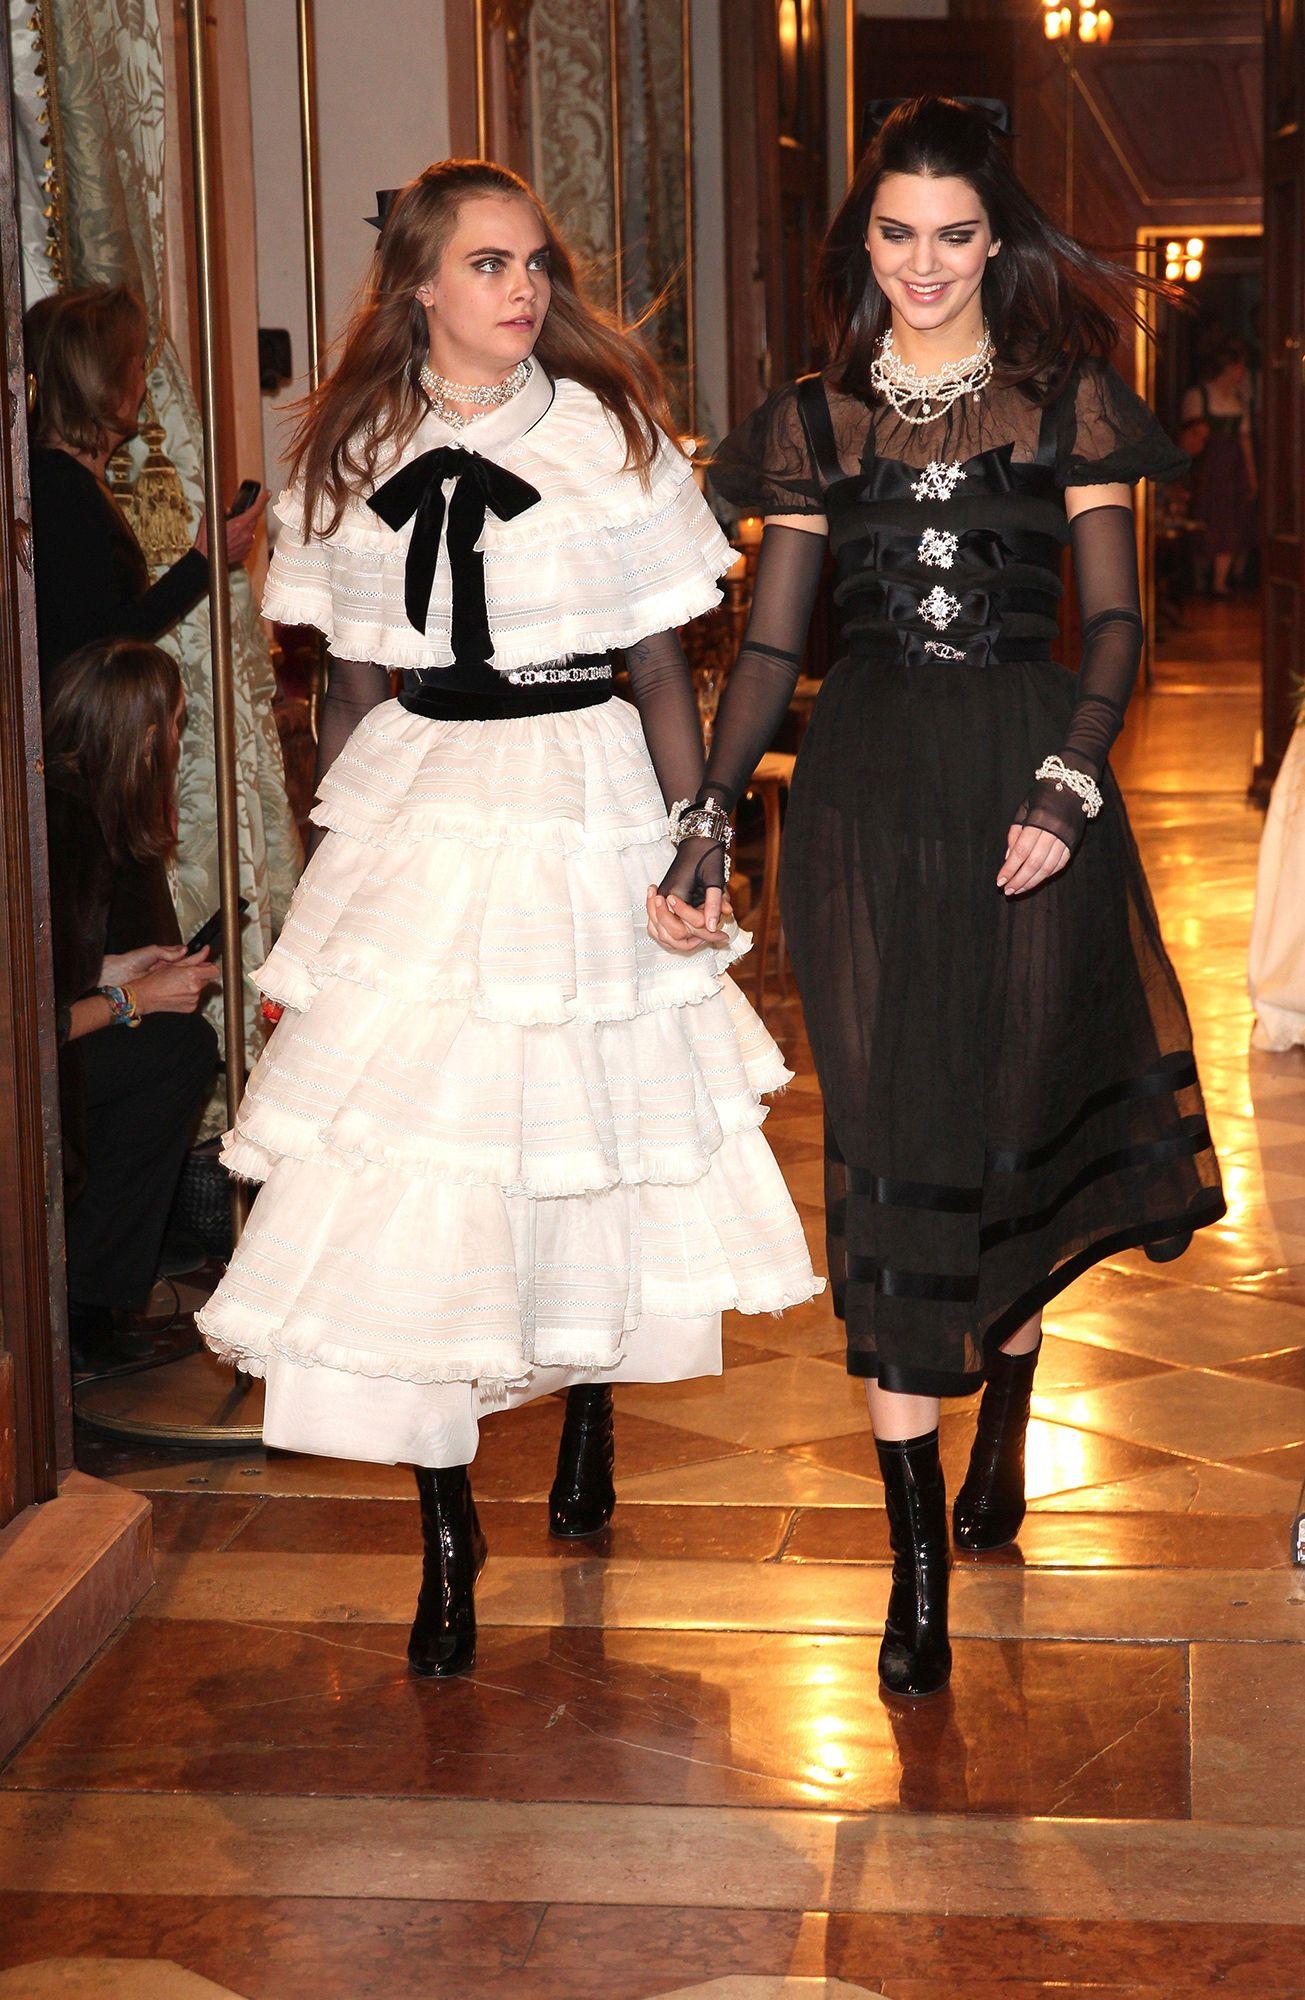 Chanel in Salzburg - Cara Delevingne and Kendall Jenner